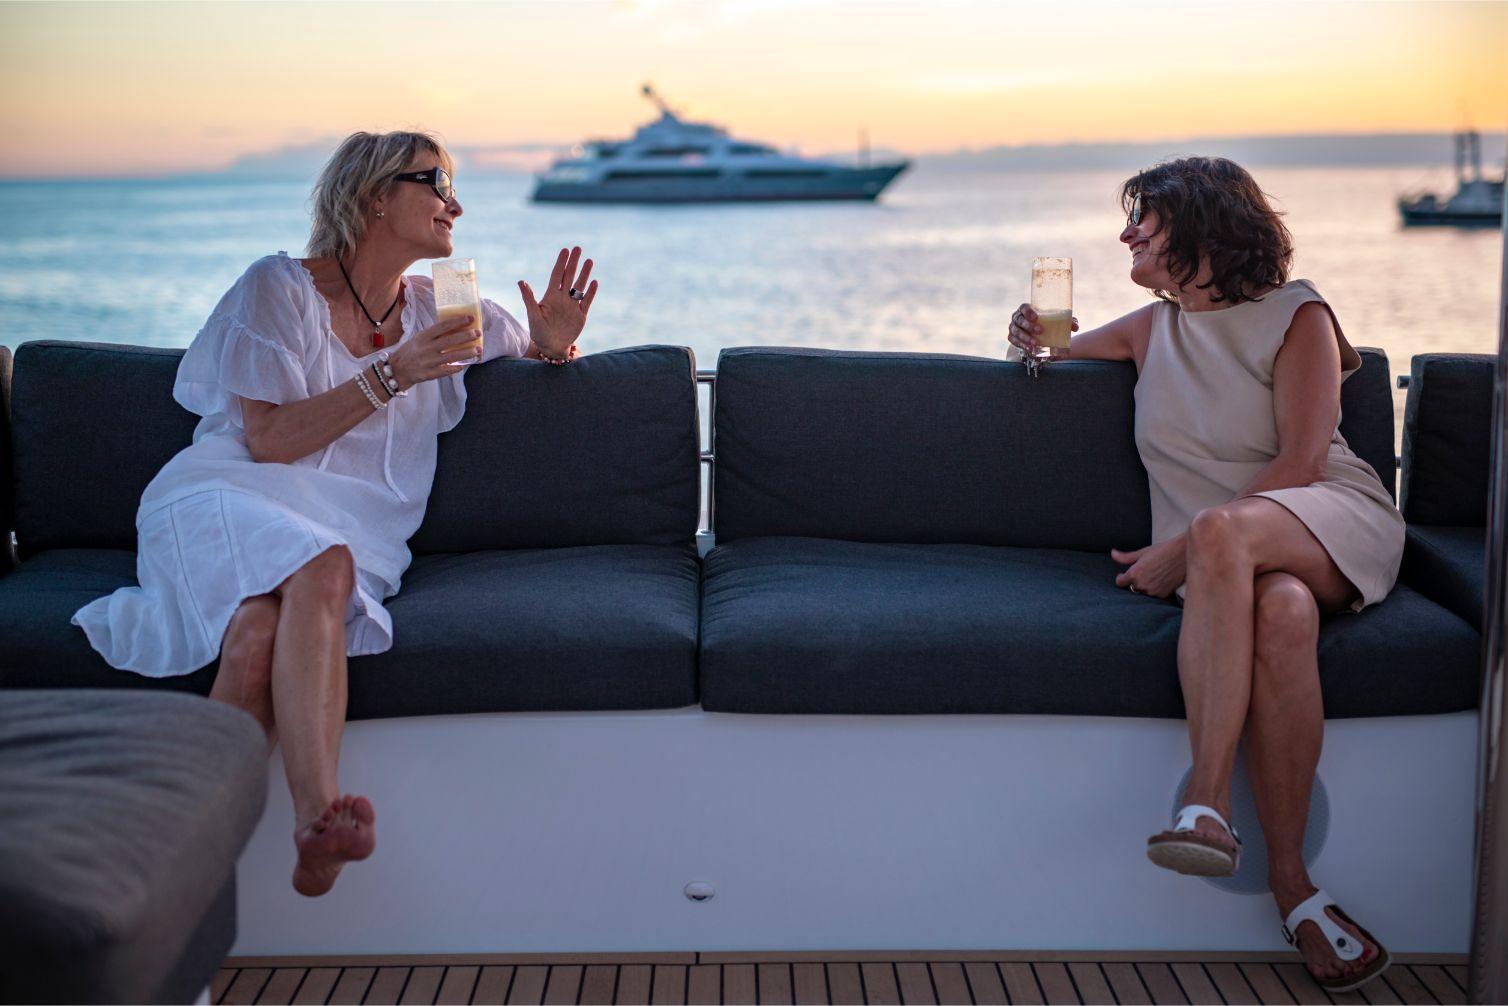 Femmes prenant un verre sur banquettes du catamaran   Bateau de Marc Saulnier   Serenity Navigation